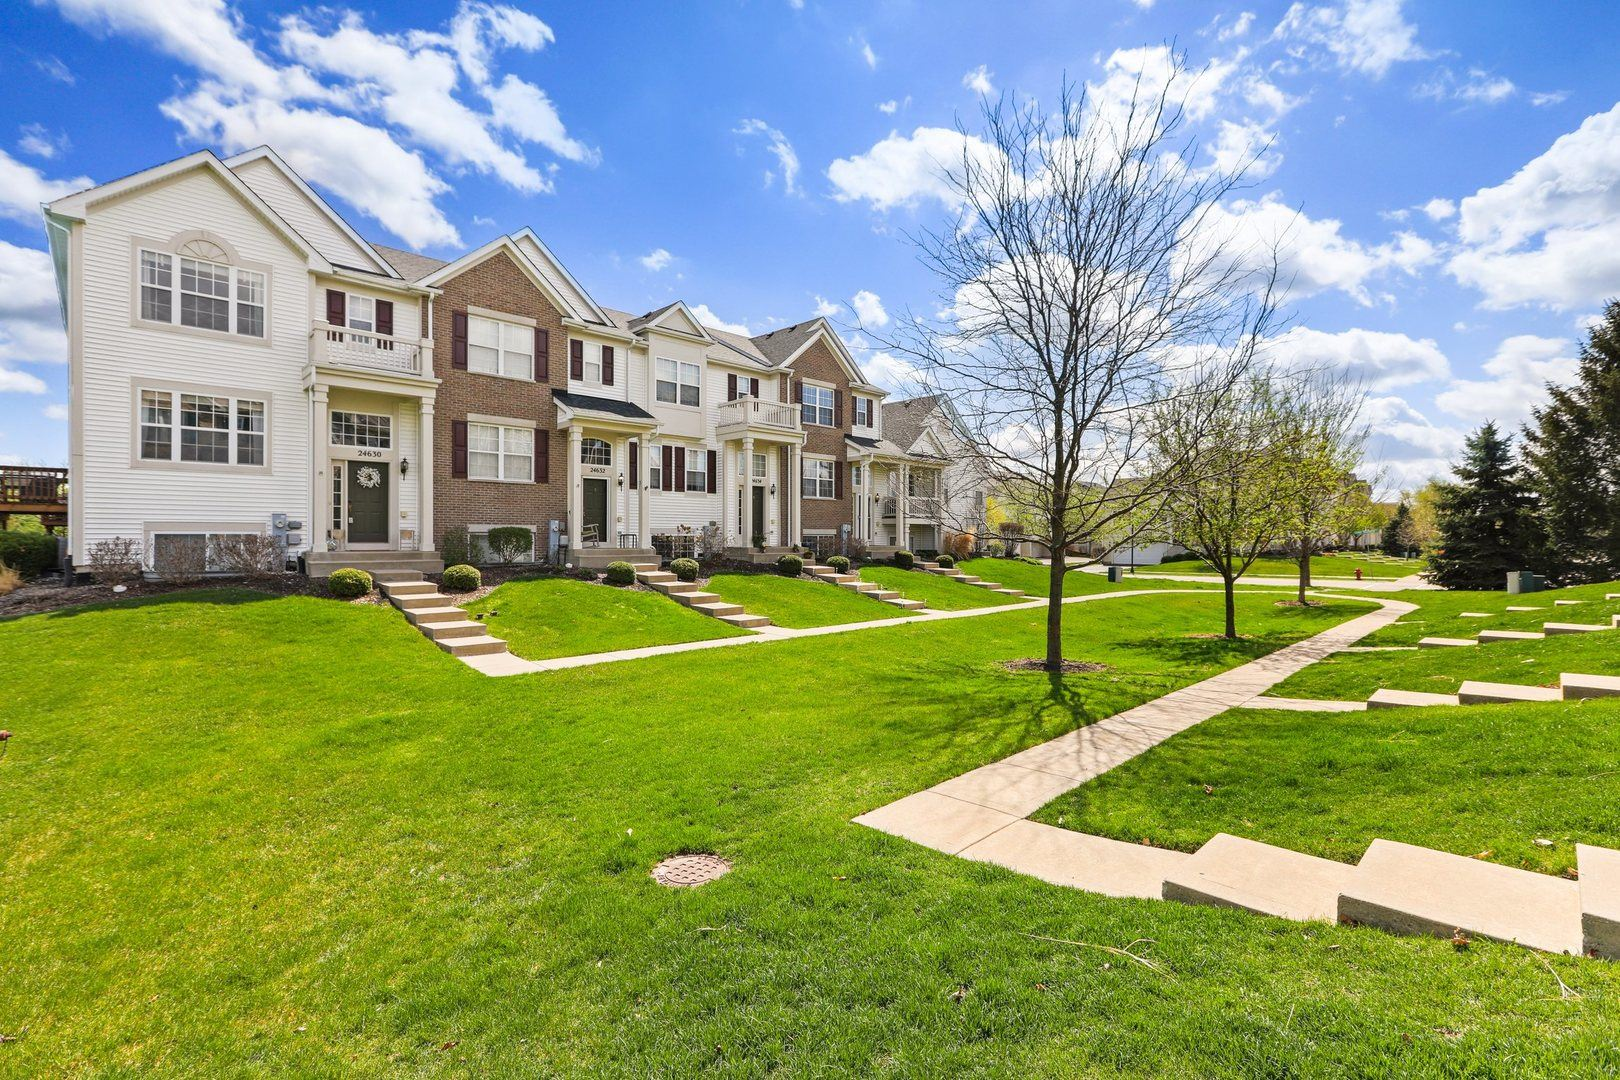 Photo of 24630 George Washington Drive, Plainfield, IL 60544 (MLS # 11048461)